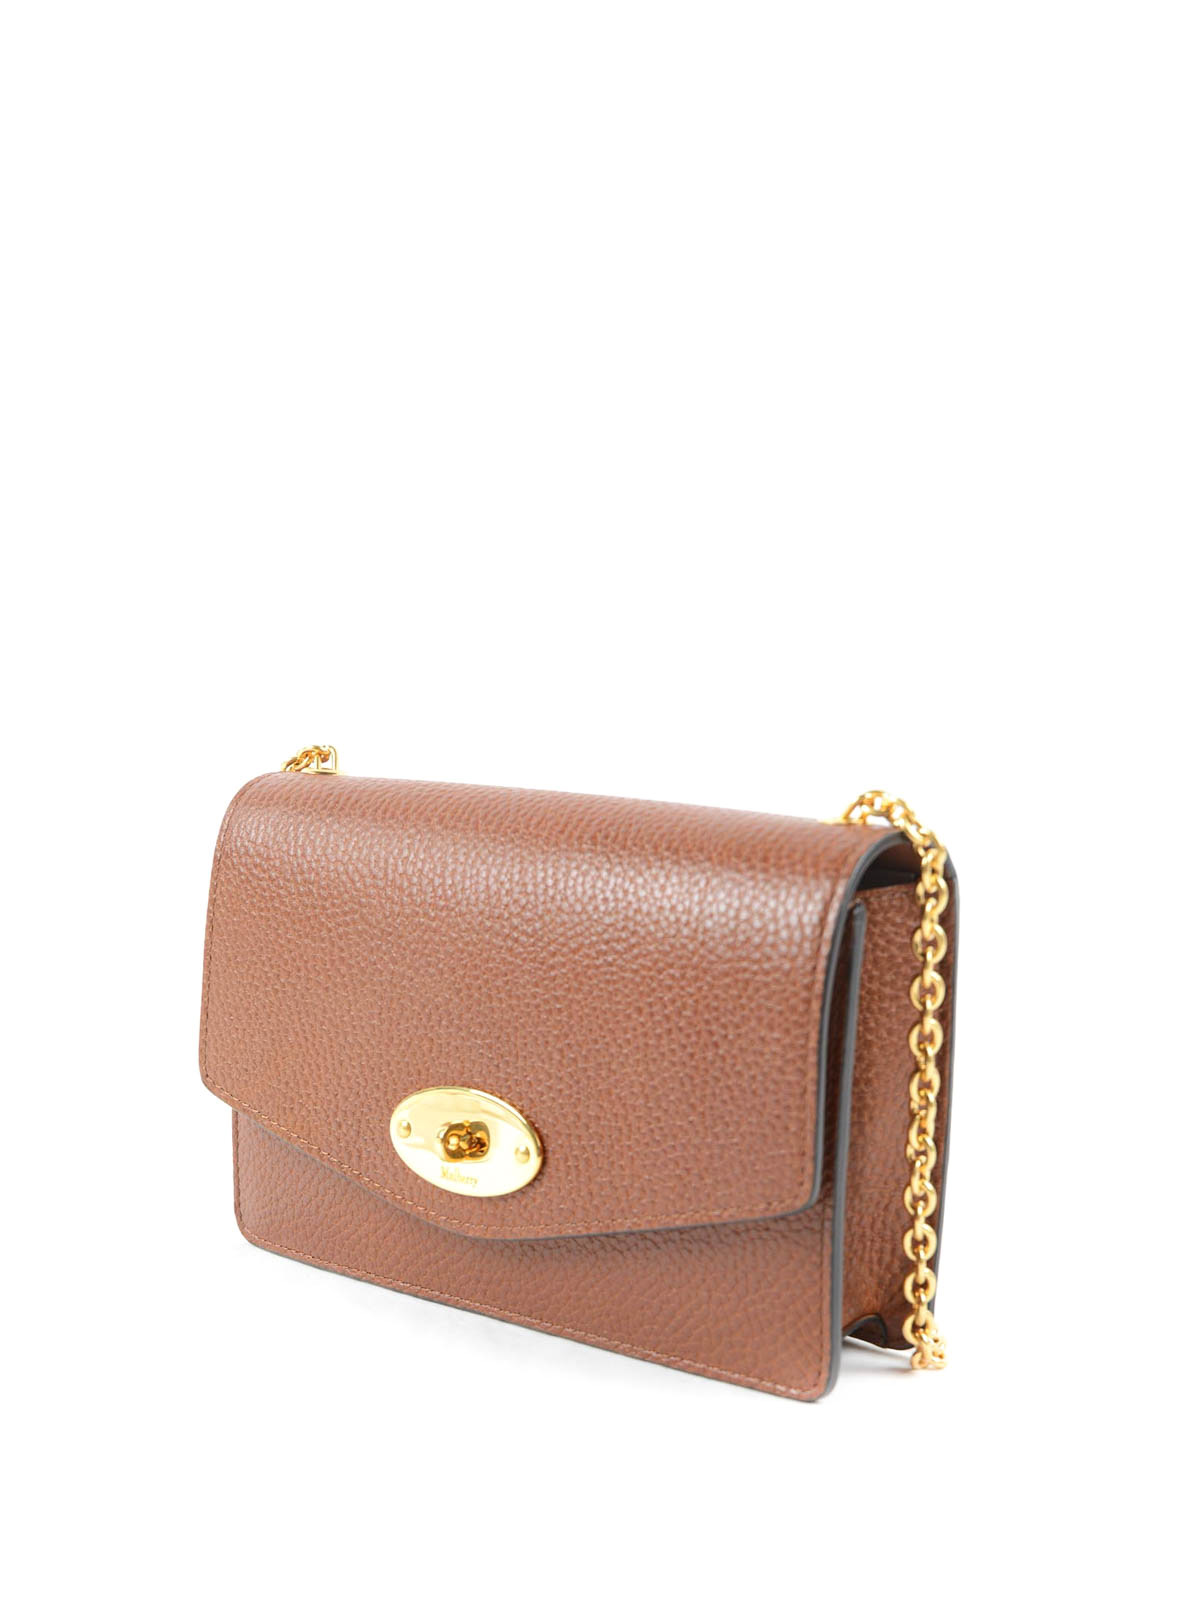 786cf08e0156 ... ebay mulberry cross body bags online darley leather small crossbody bag  d7bfb b154c